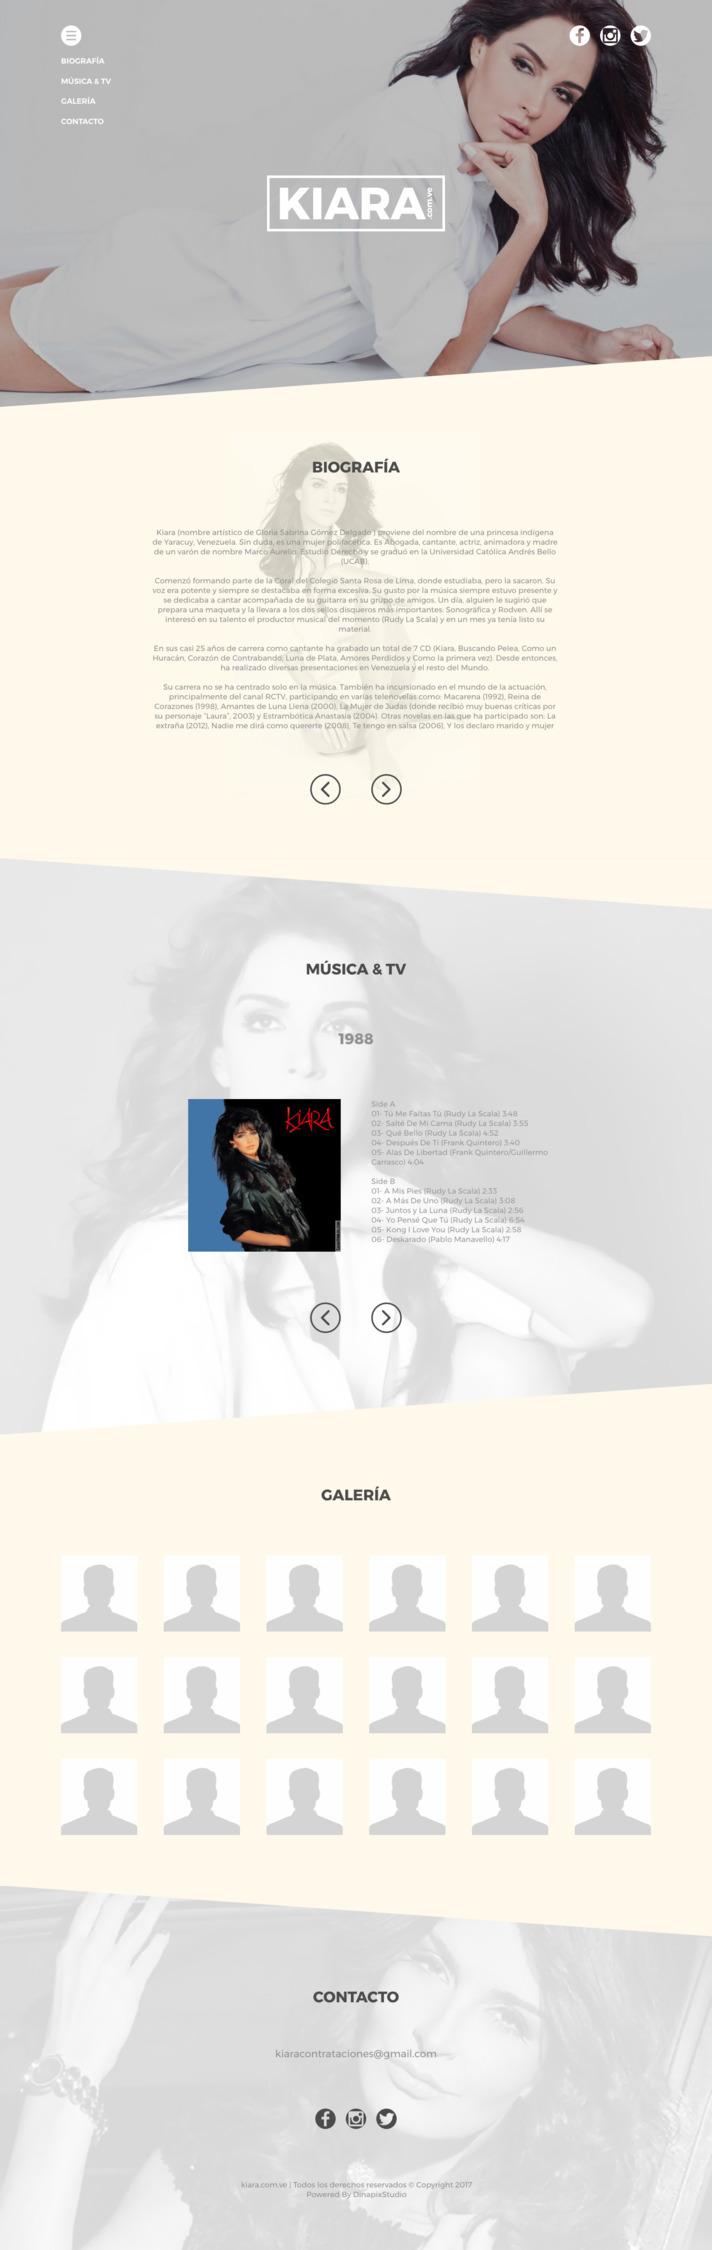 Kiara - behance, css, dinapix, design - dinapixstudio | ello